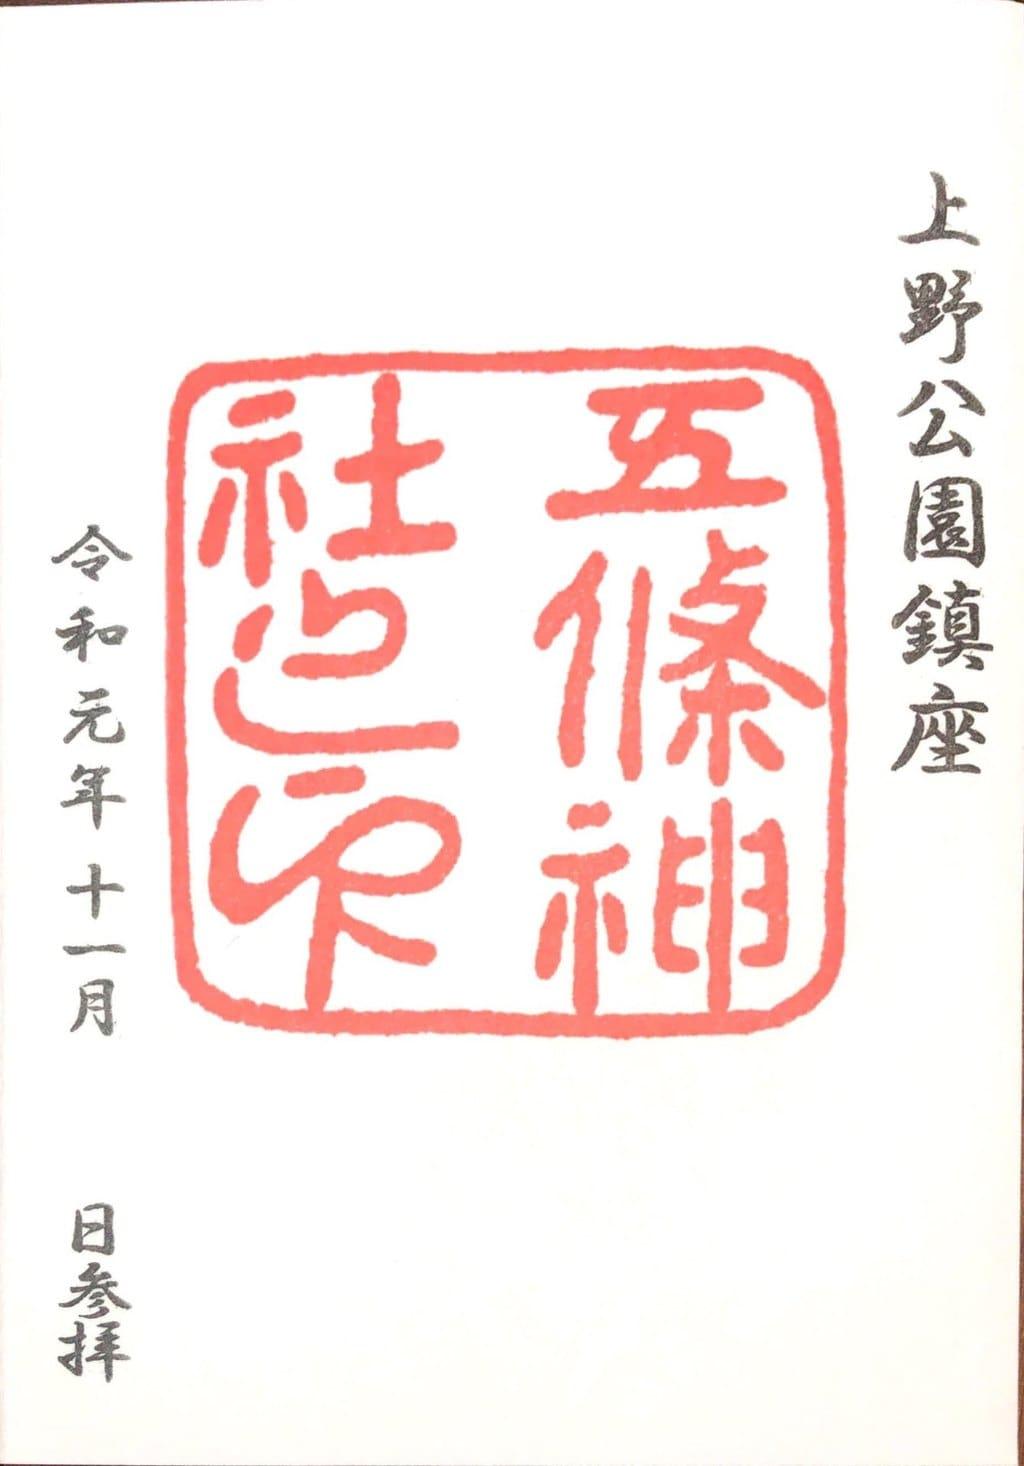 五條天神社の御朱印